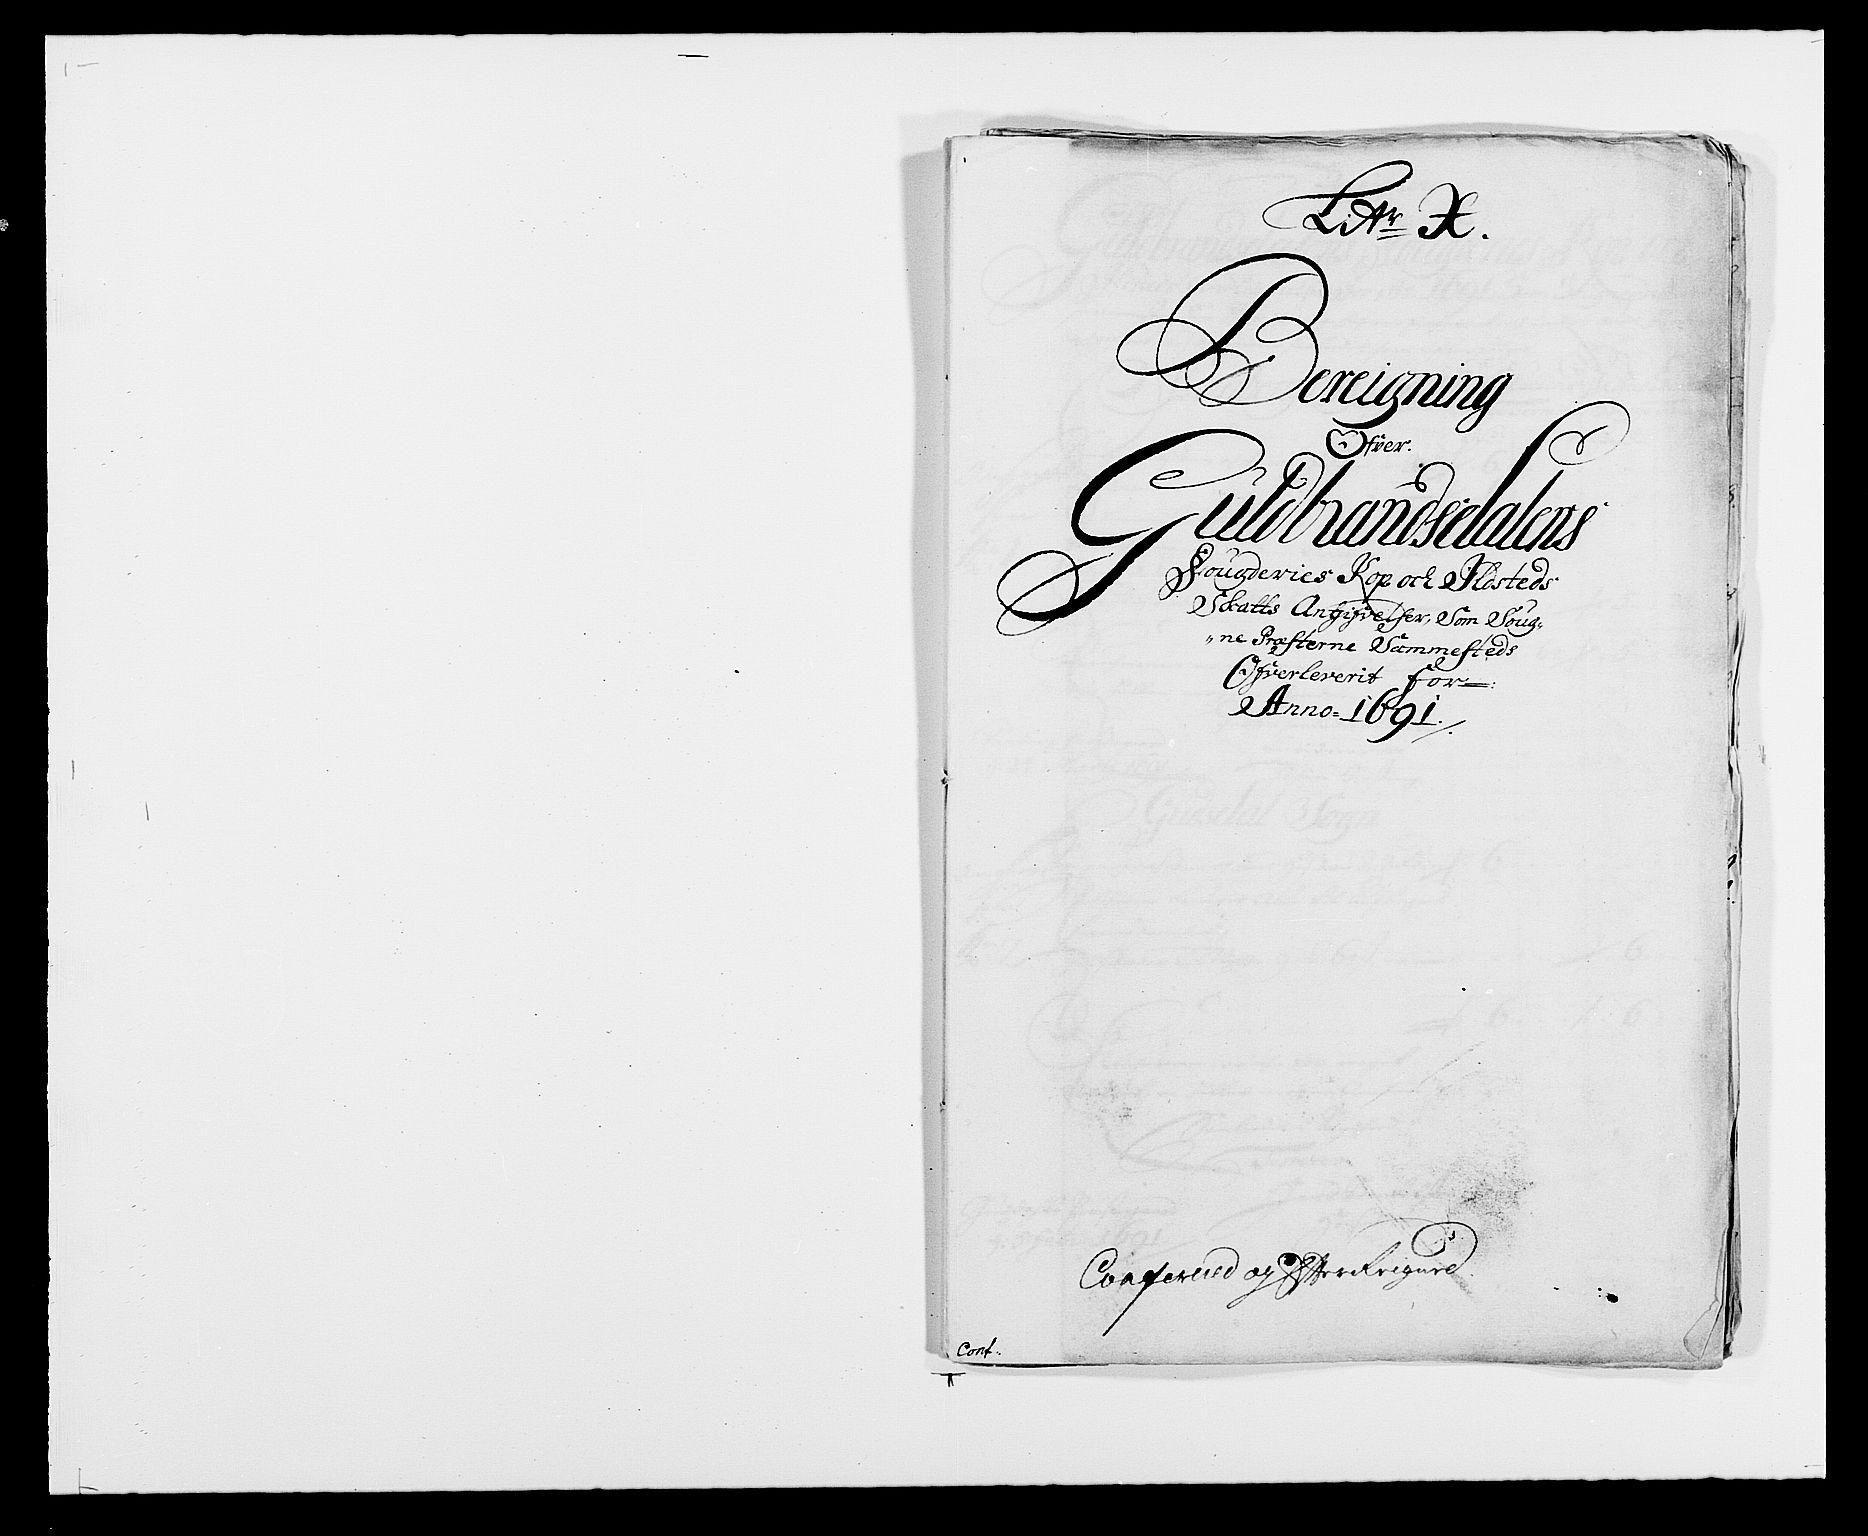 RA, Rentekammeret inntil 1814, Reviderte regnskaper, Fogderegnskap, R17/L1165: Fogderegnskap Gudbrandsdal, 1690-1692, s. 348